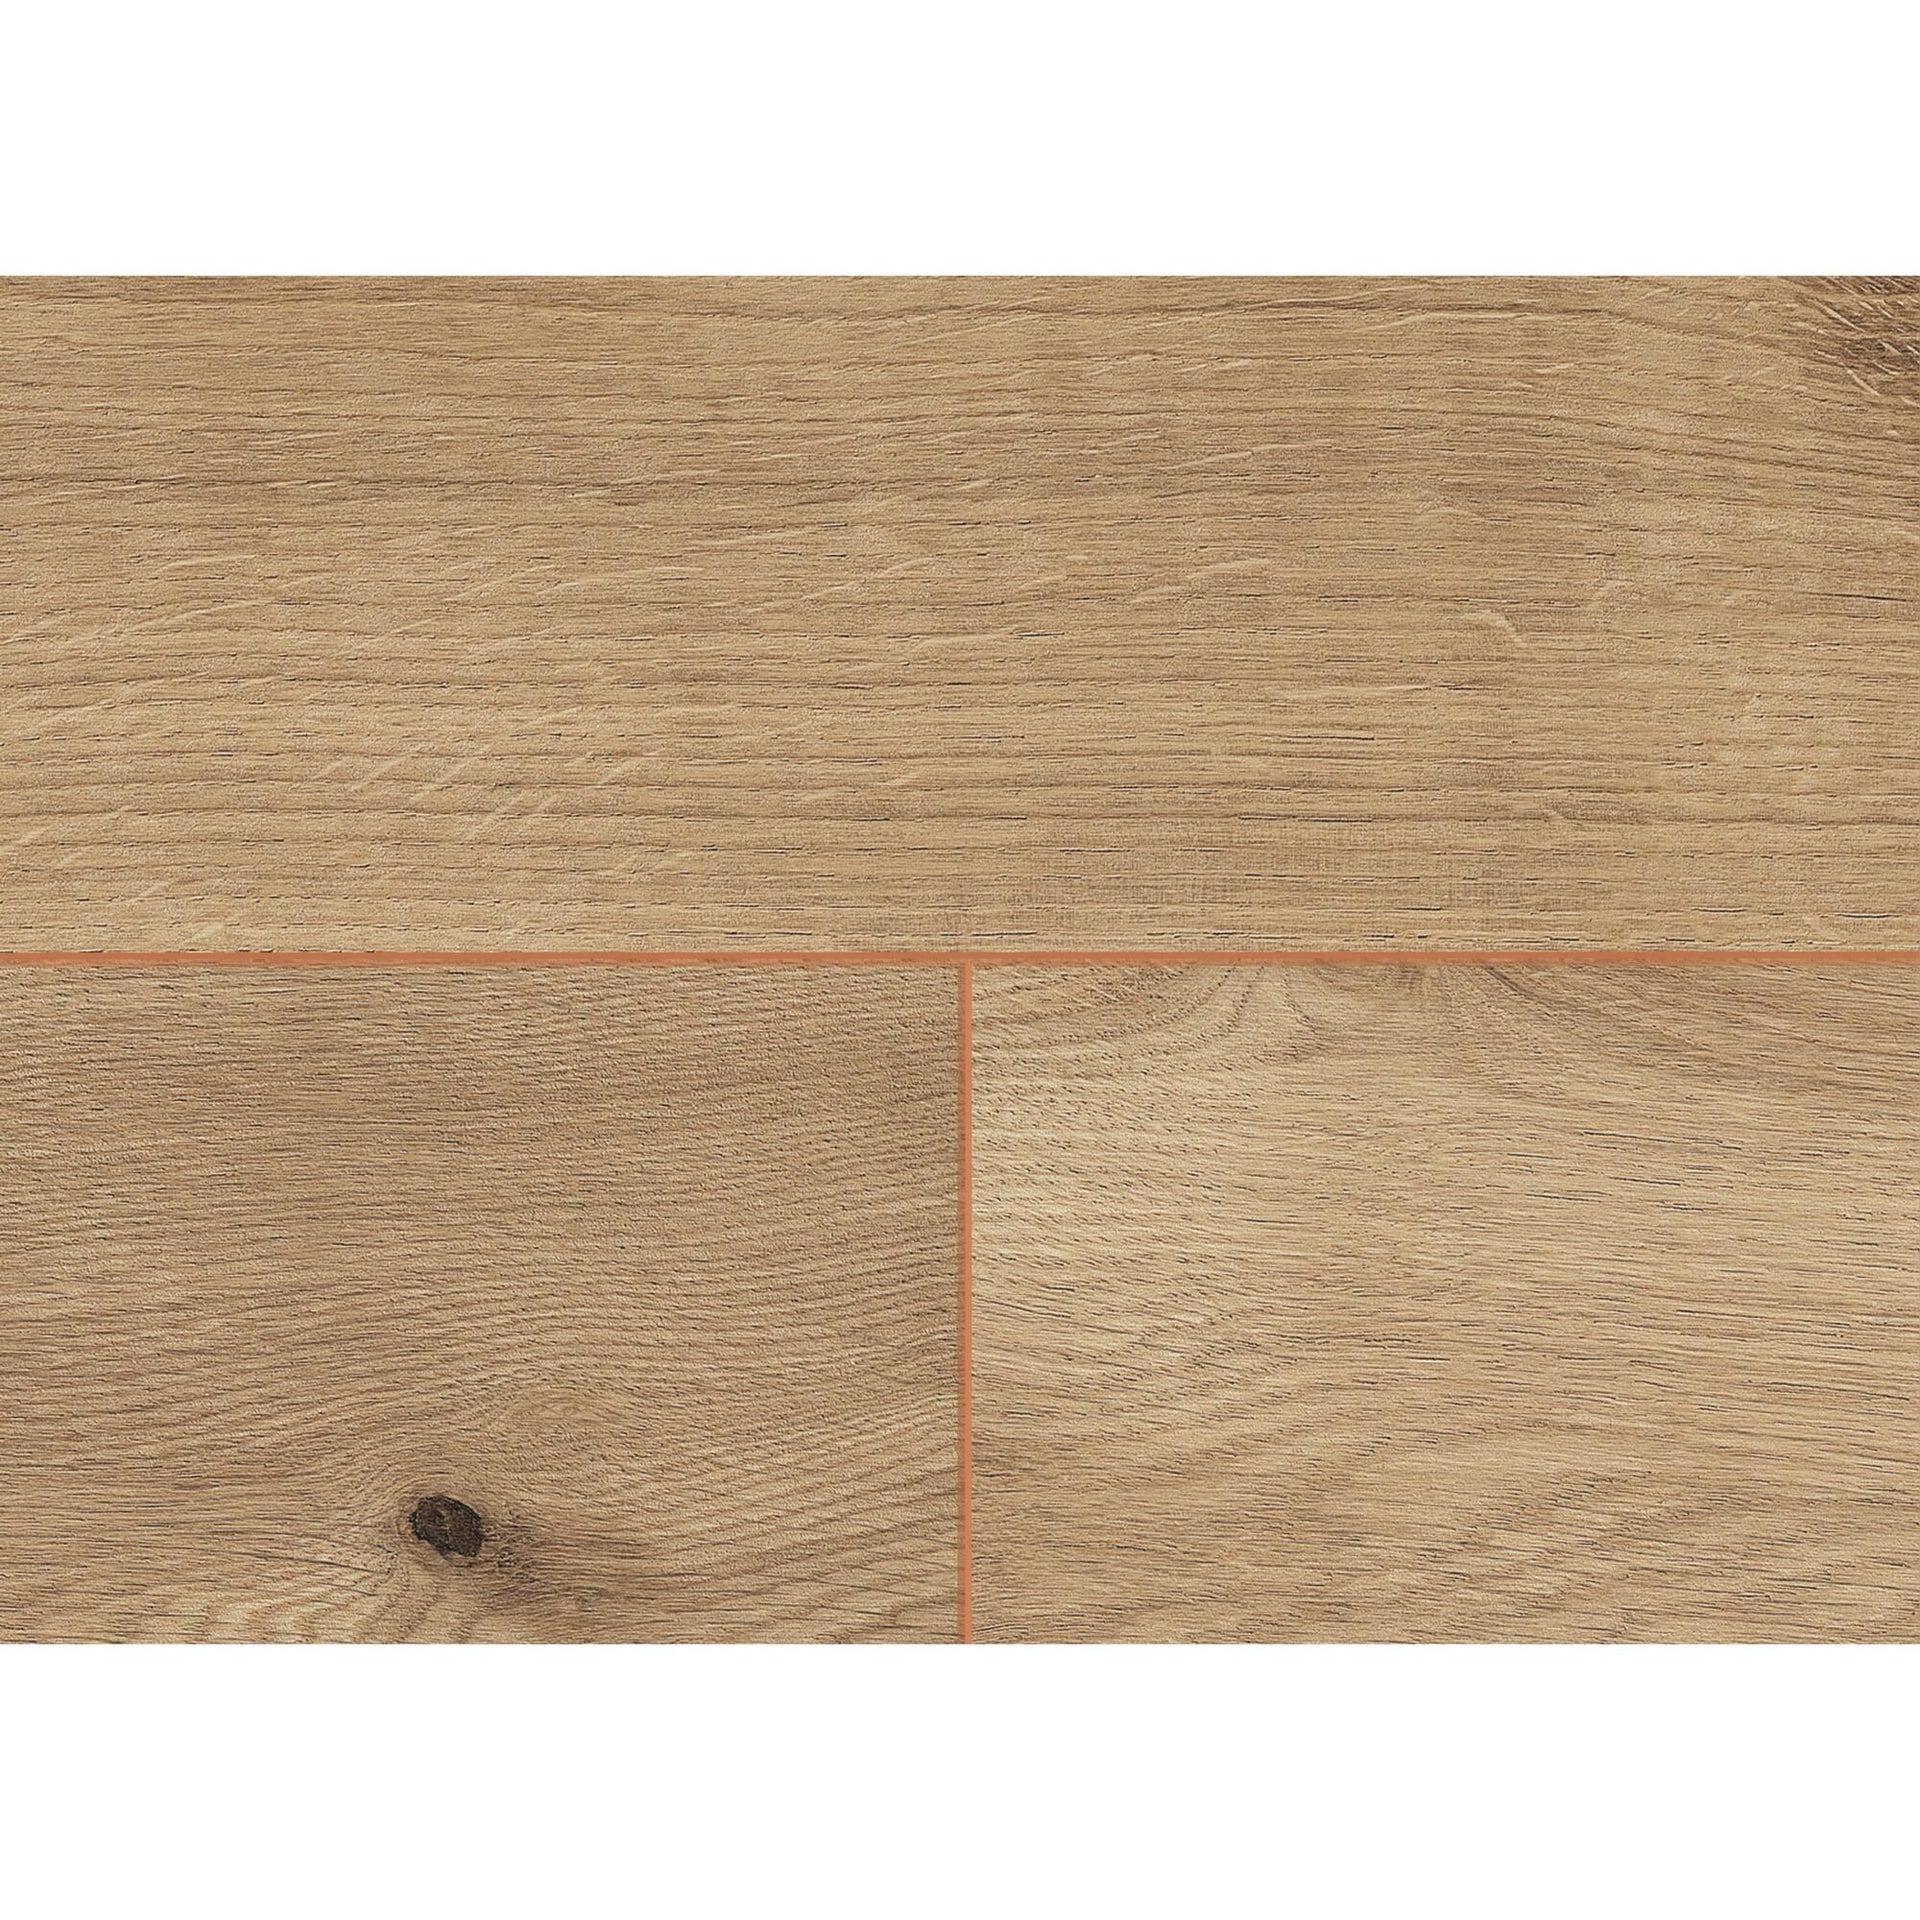 Pavimento SPC flottante clic+ Pietra Nova brown Sp 4.4 mm giallo / dorato - 4